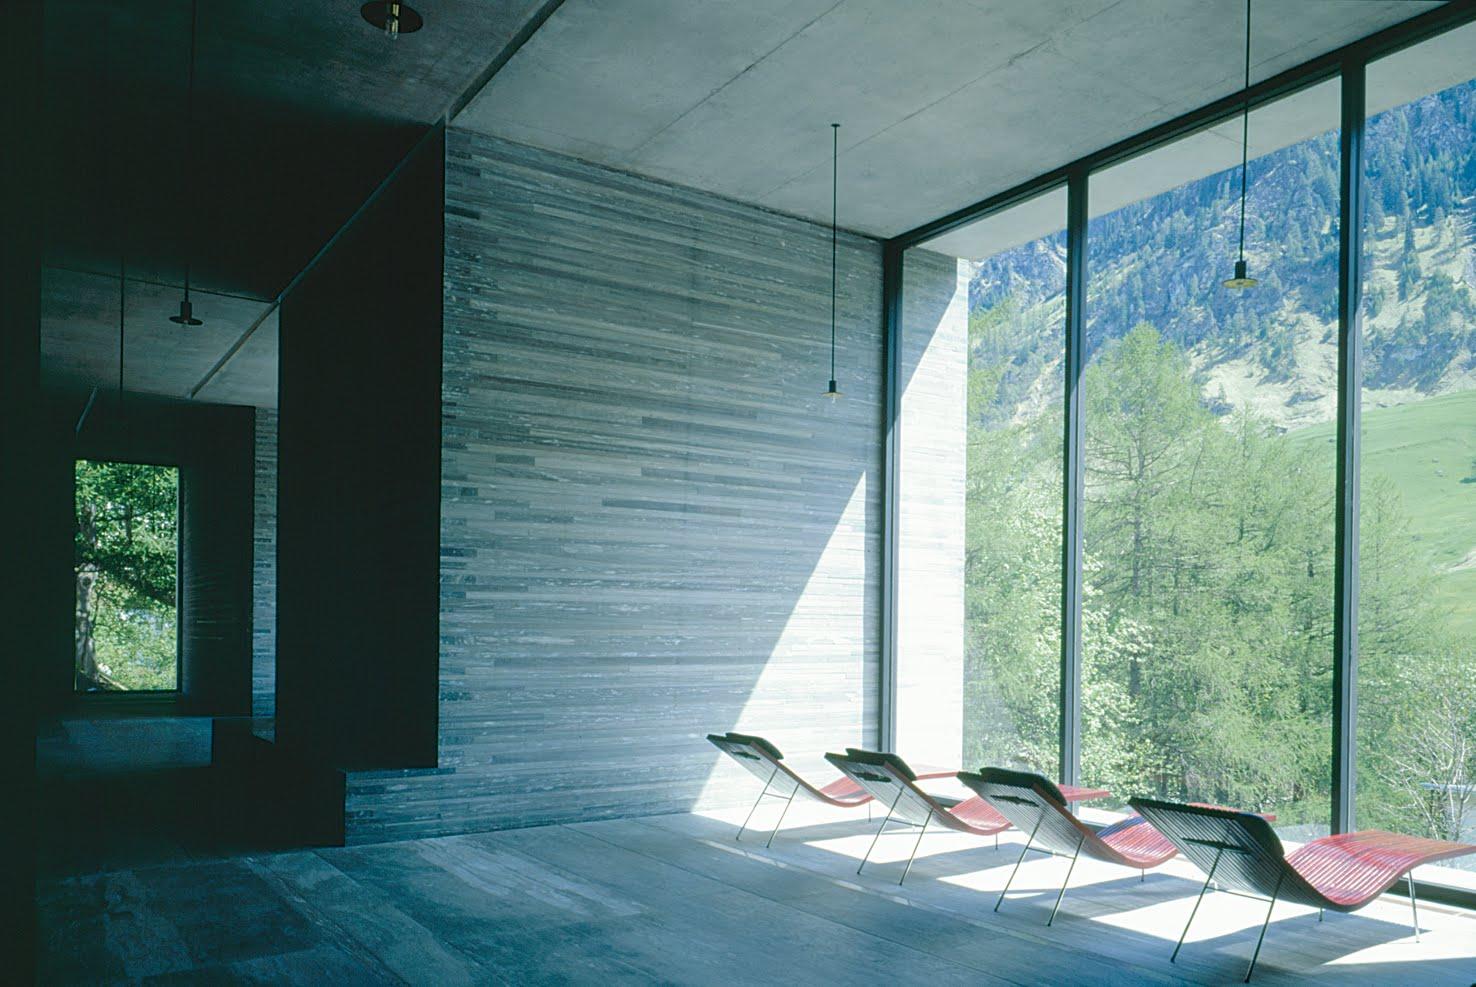 Prancheta de arquiteto proj lazer hotel therme vals for Design hotel vals